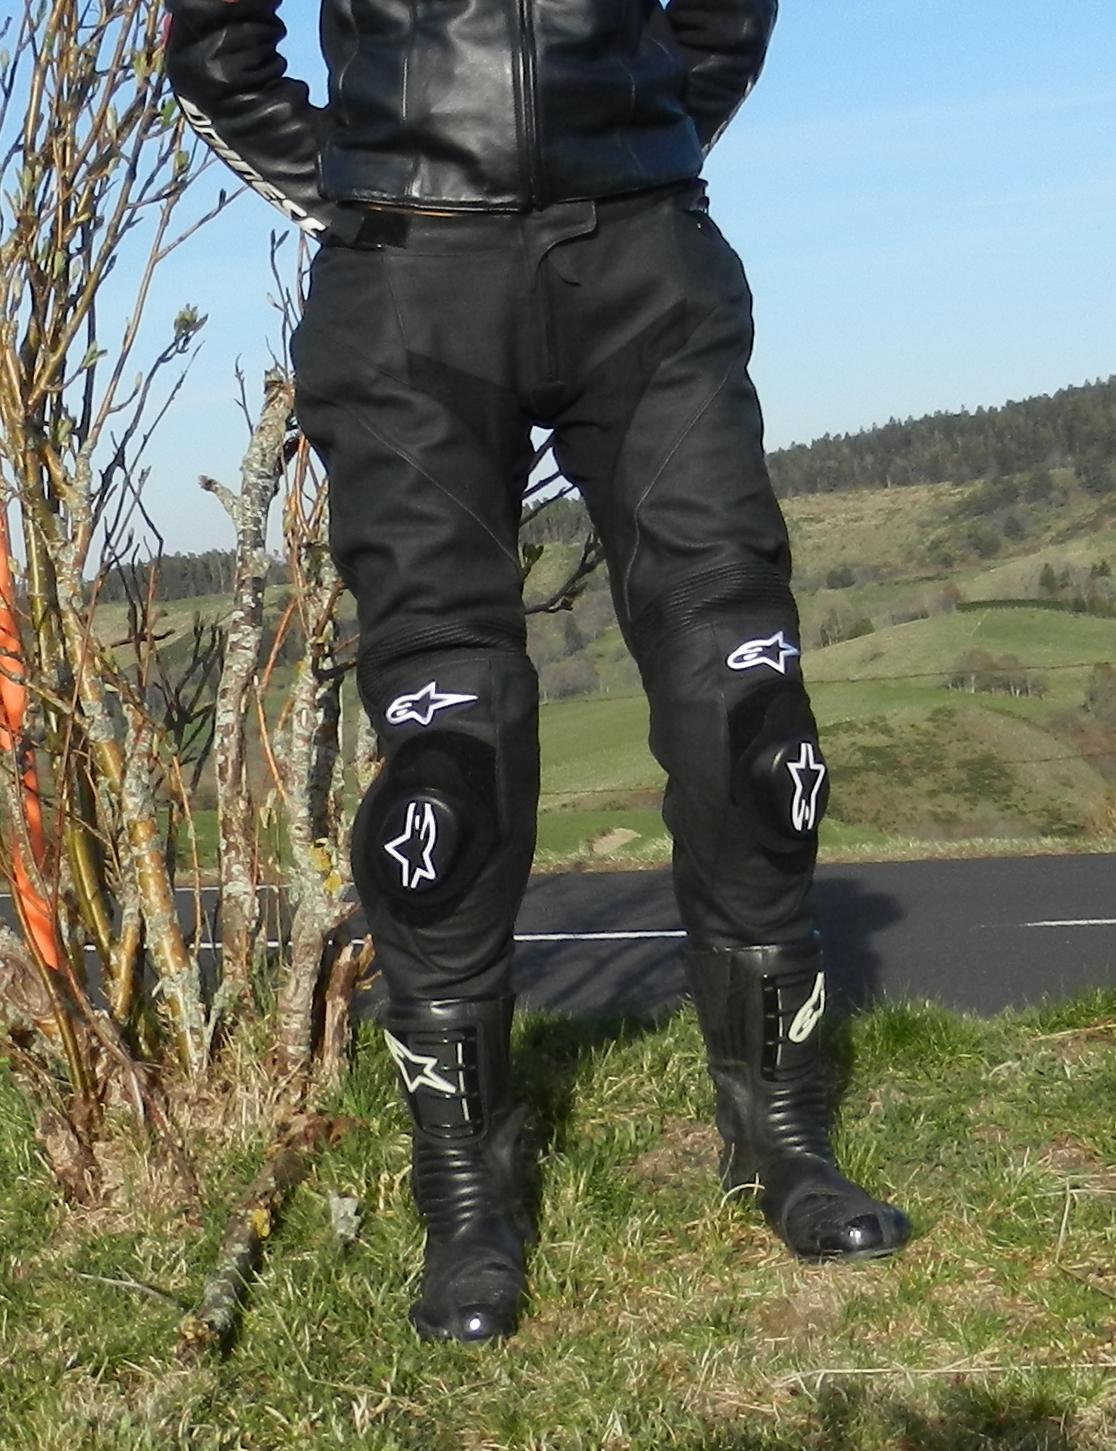 Alpinestars Stella Missile Un Pantalon Moto Pour Aller Vite